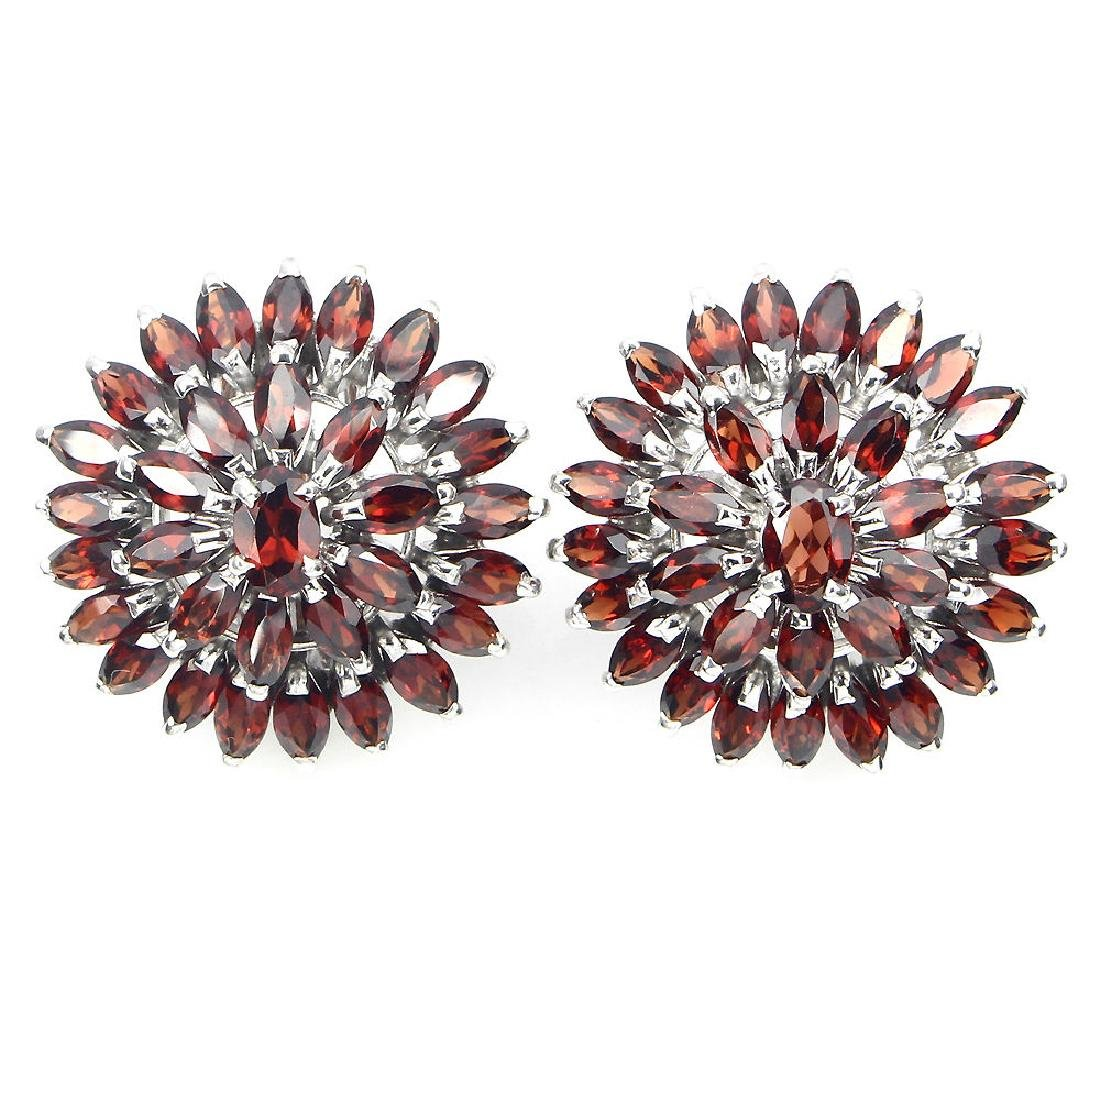 Natural Mozambique Garnet 54 Carats Earrings